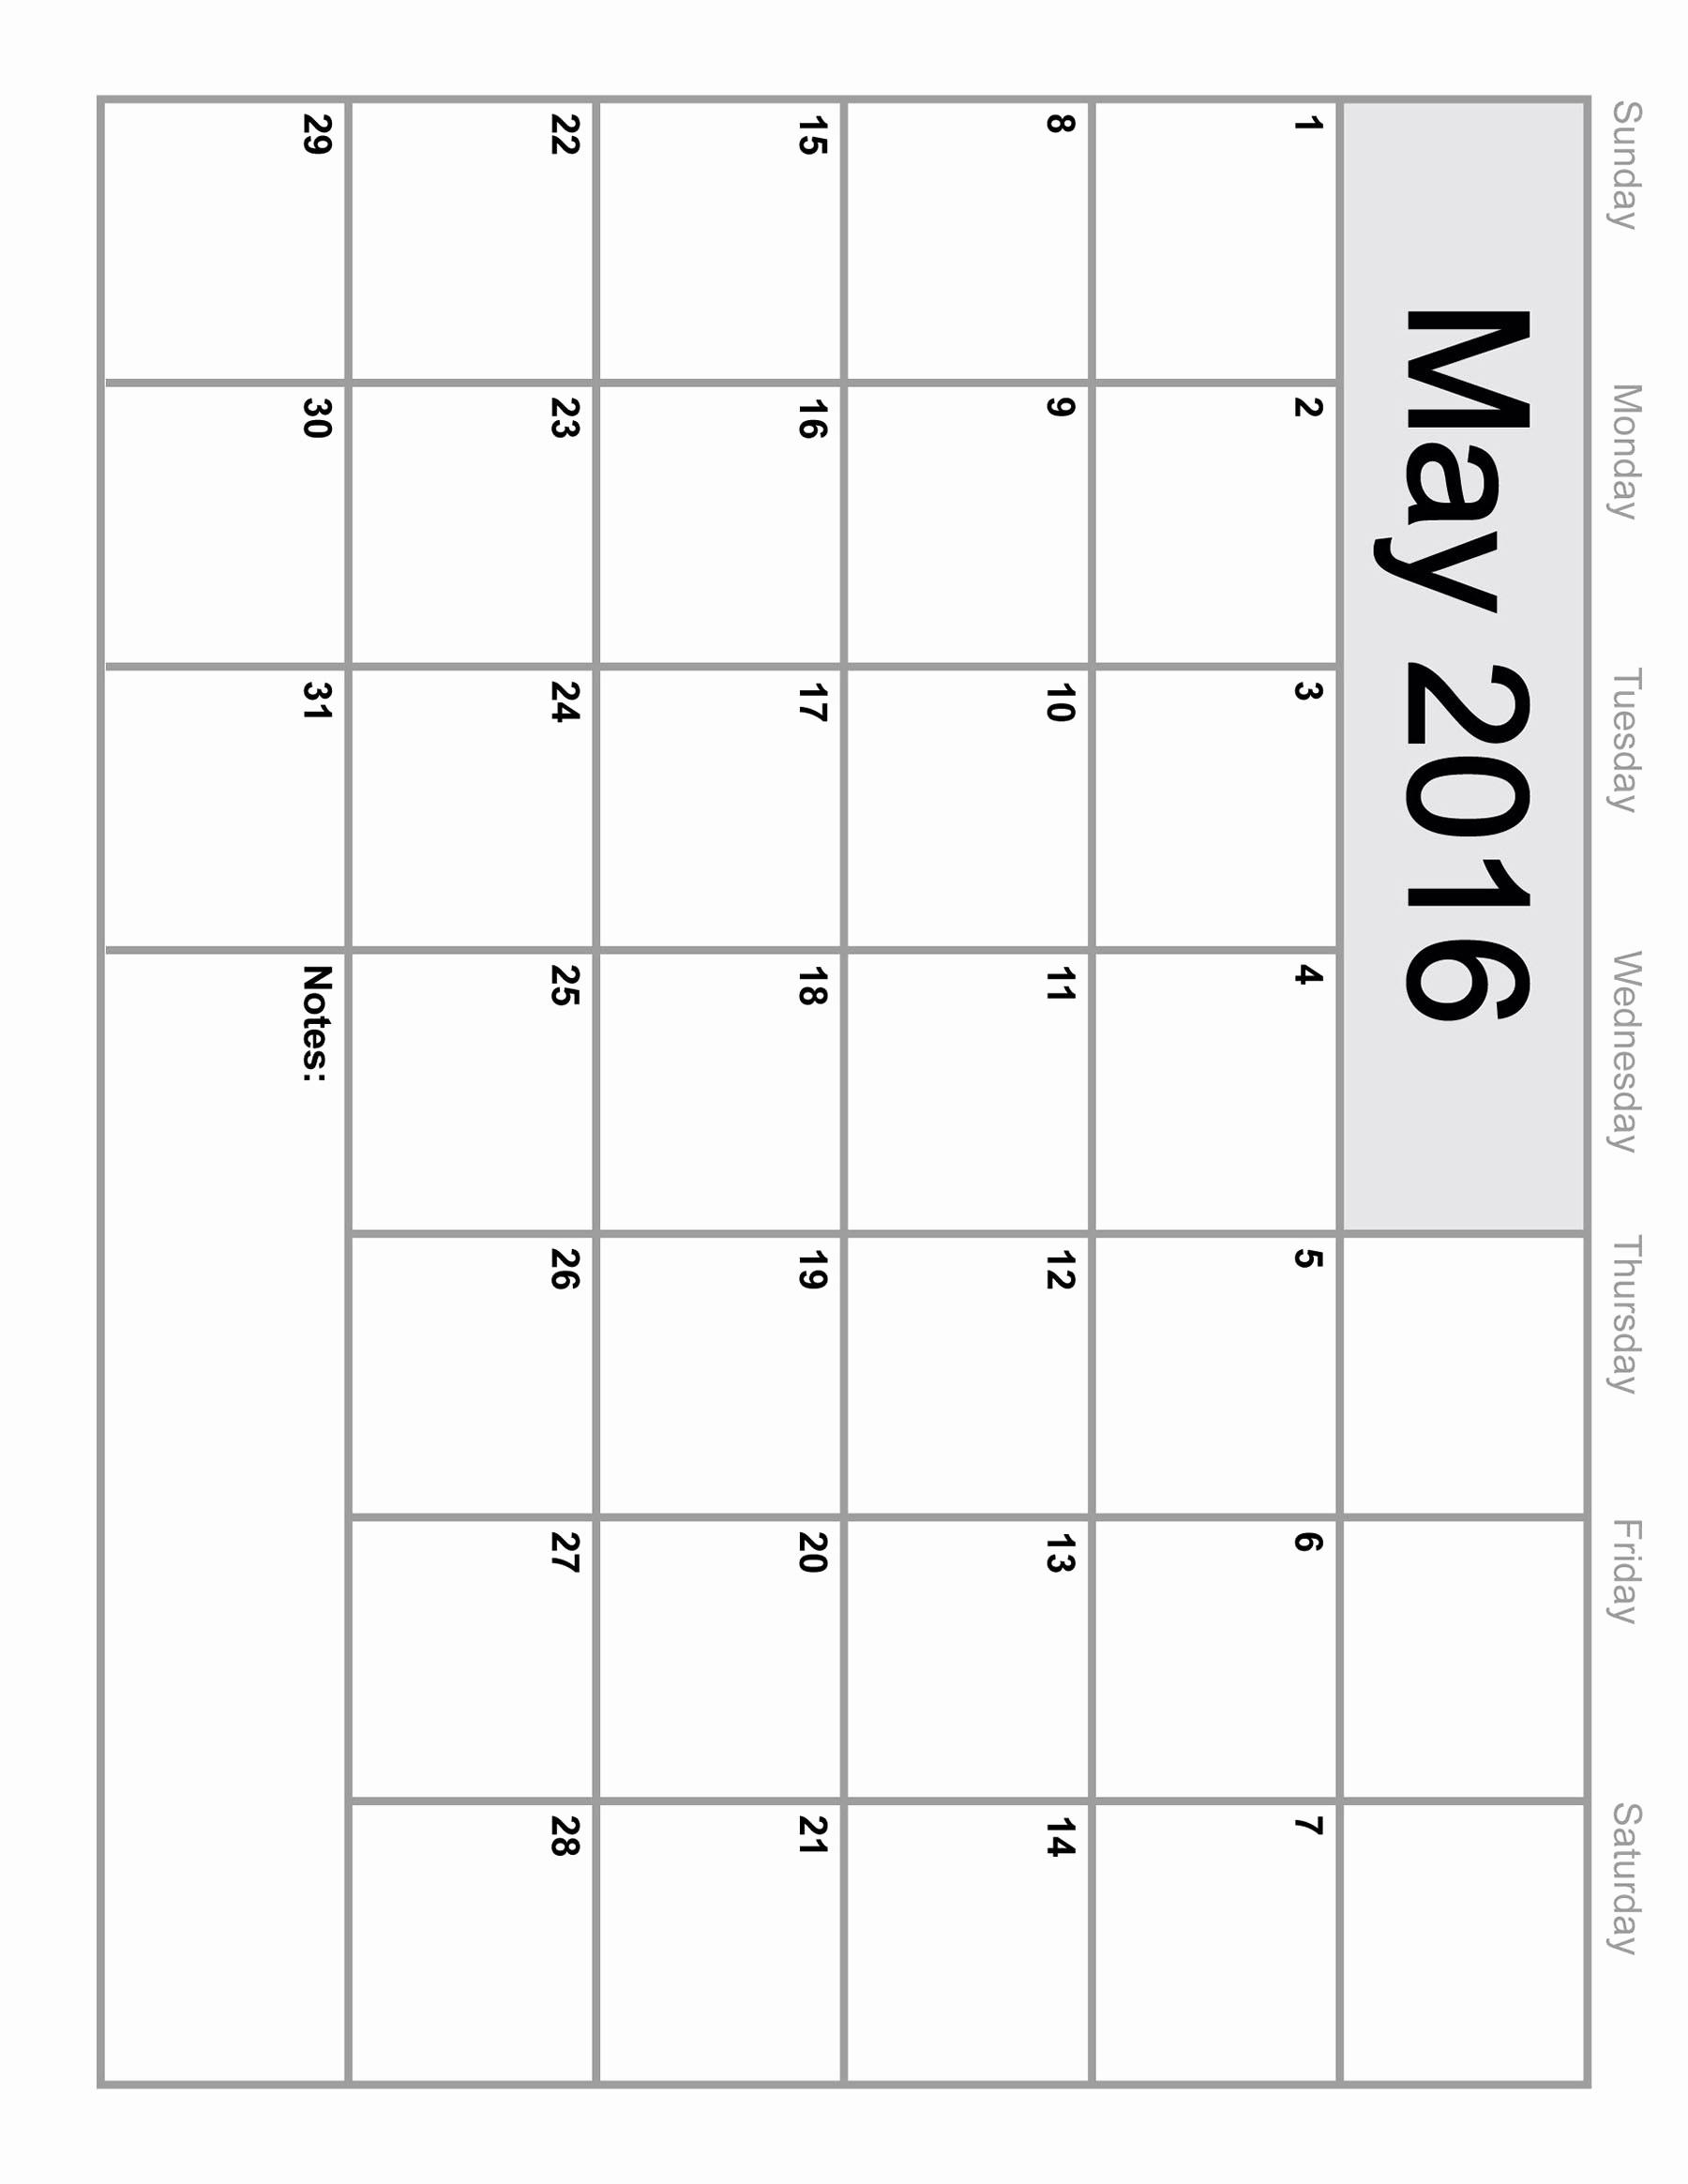 3 Month Calendar Printable 2016 Inspirational 3 Month June July August Calendar 2016 Printable